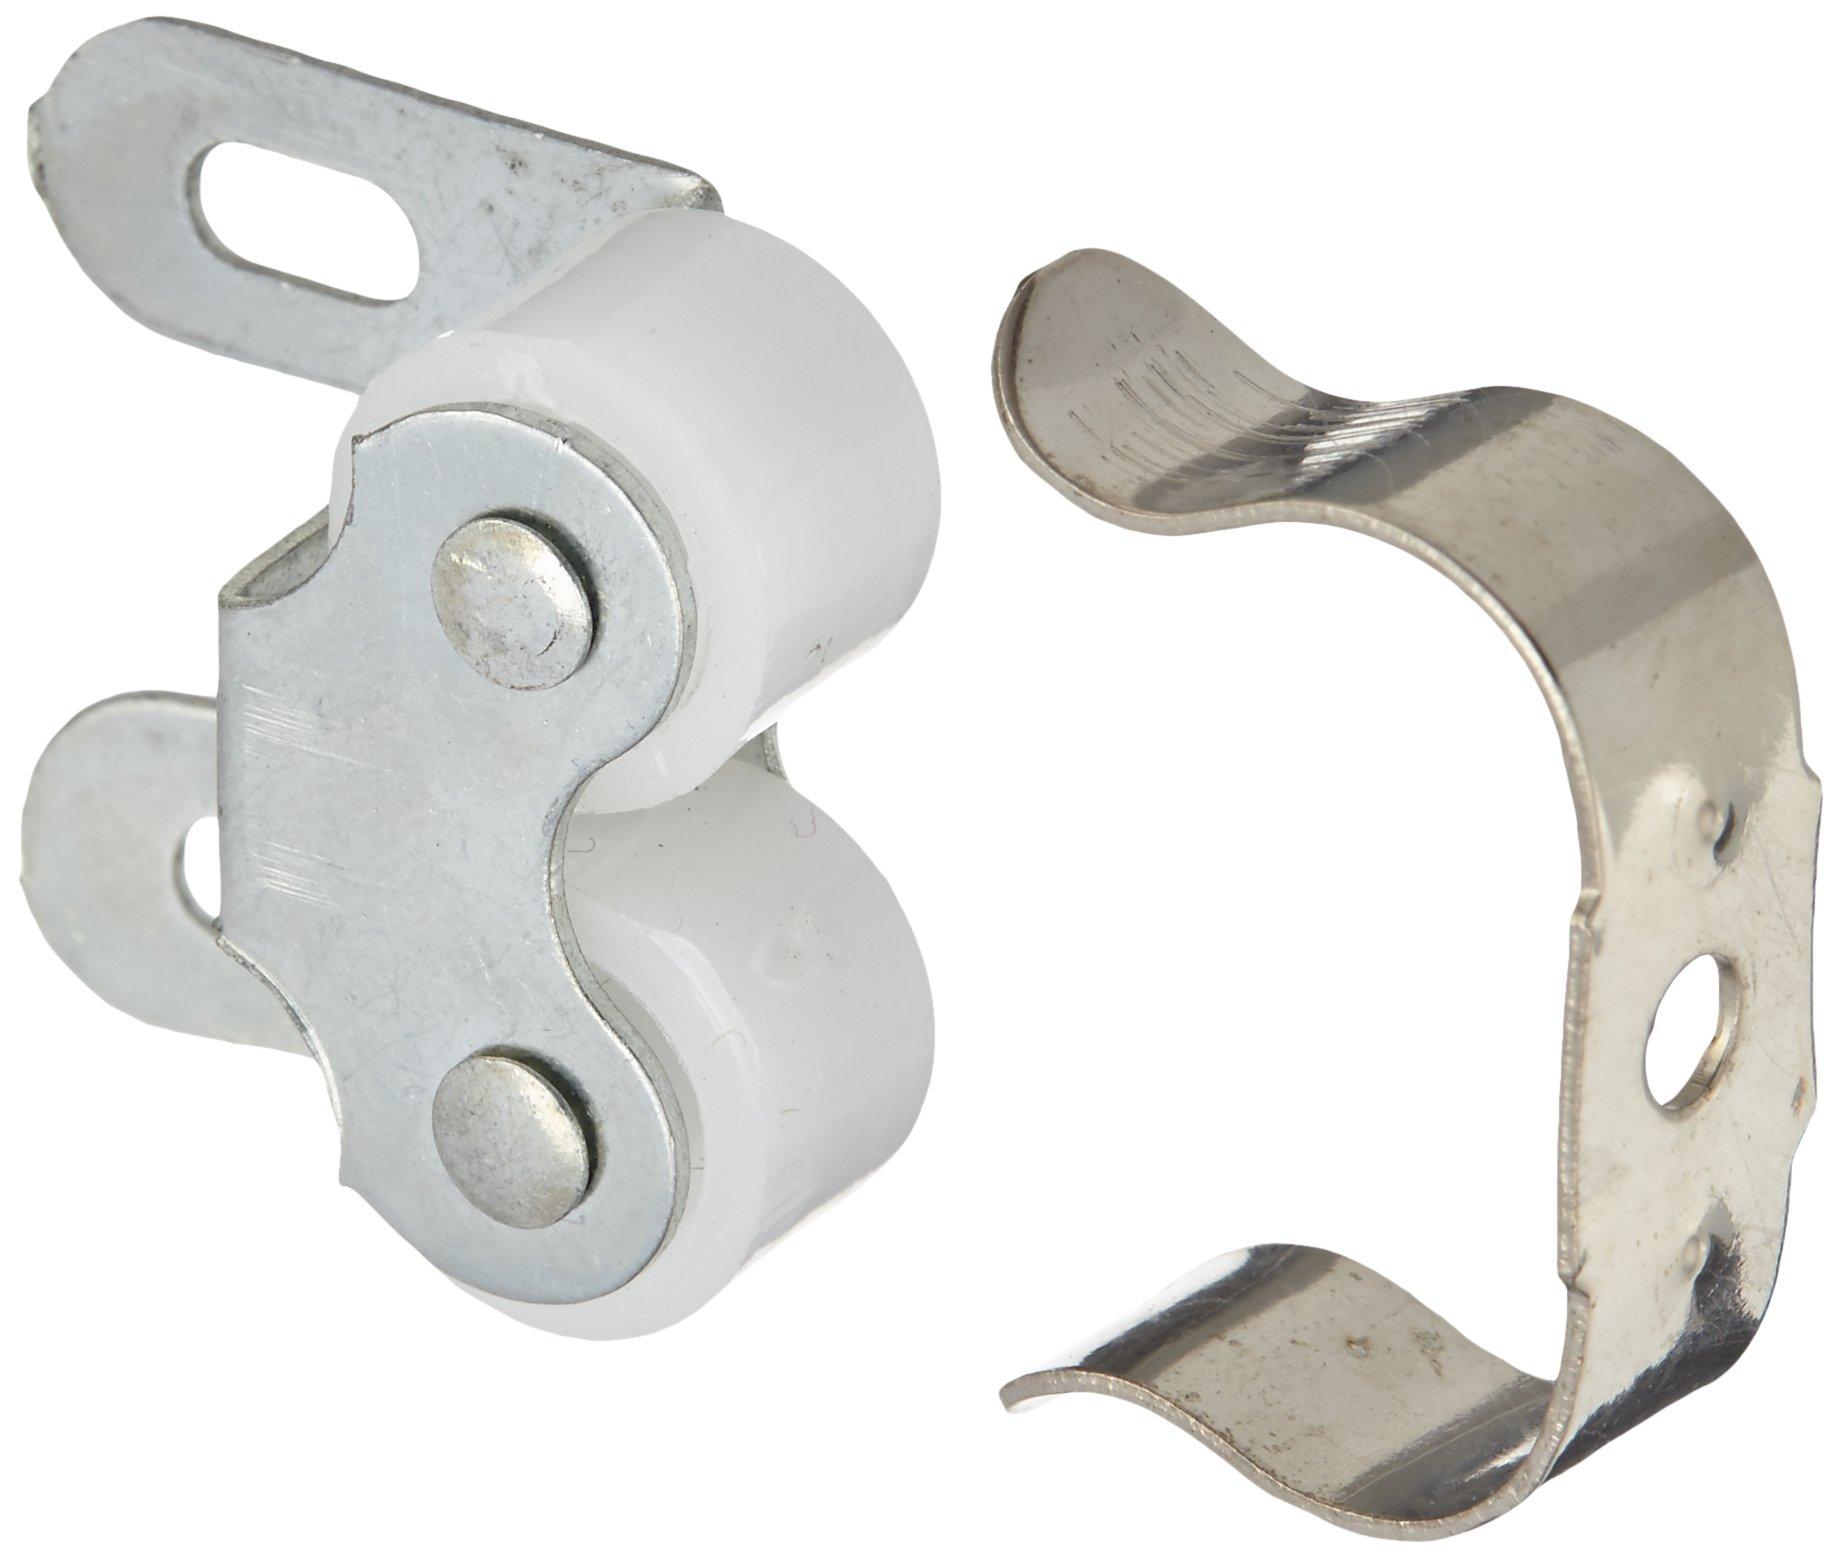 Amerock 147 Double Roller Catch - Zinc